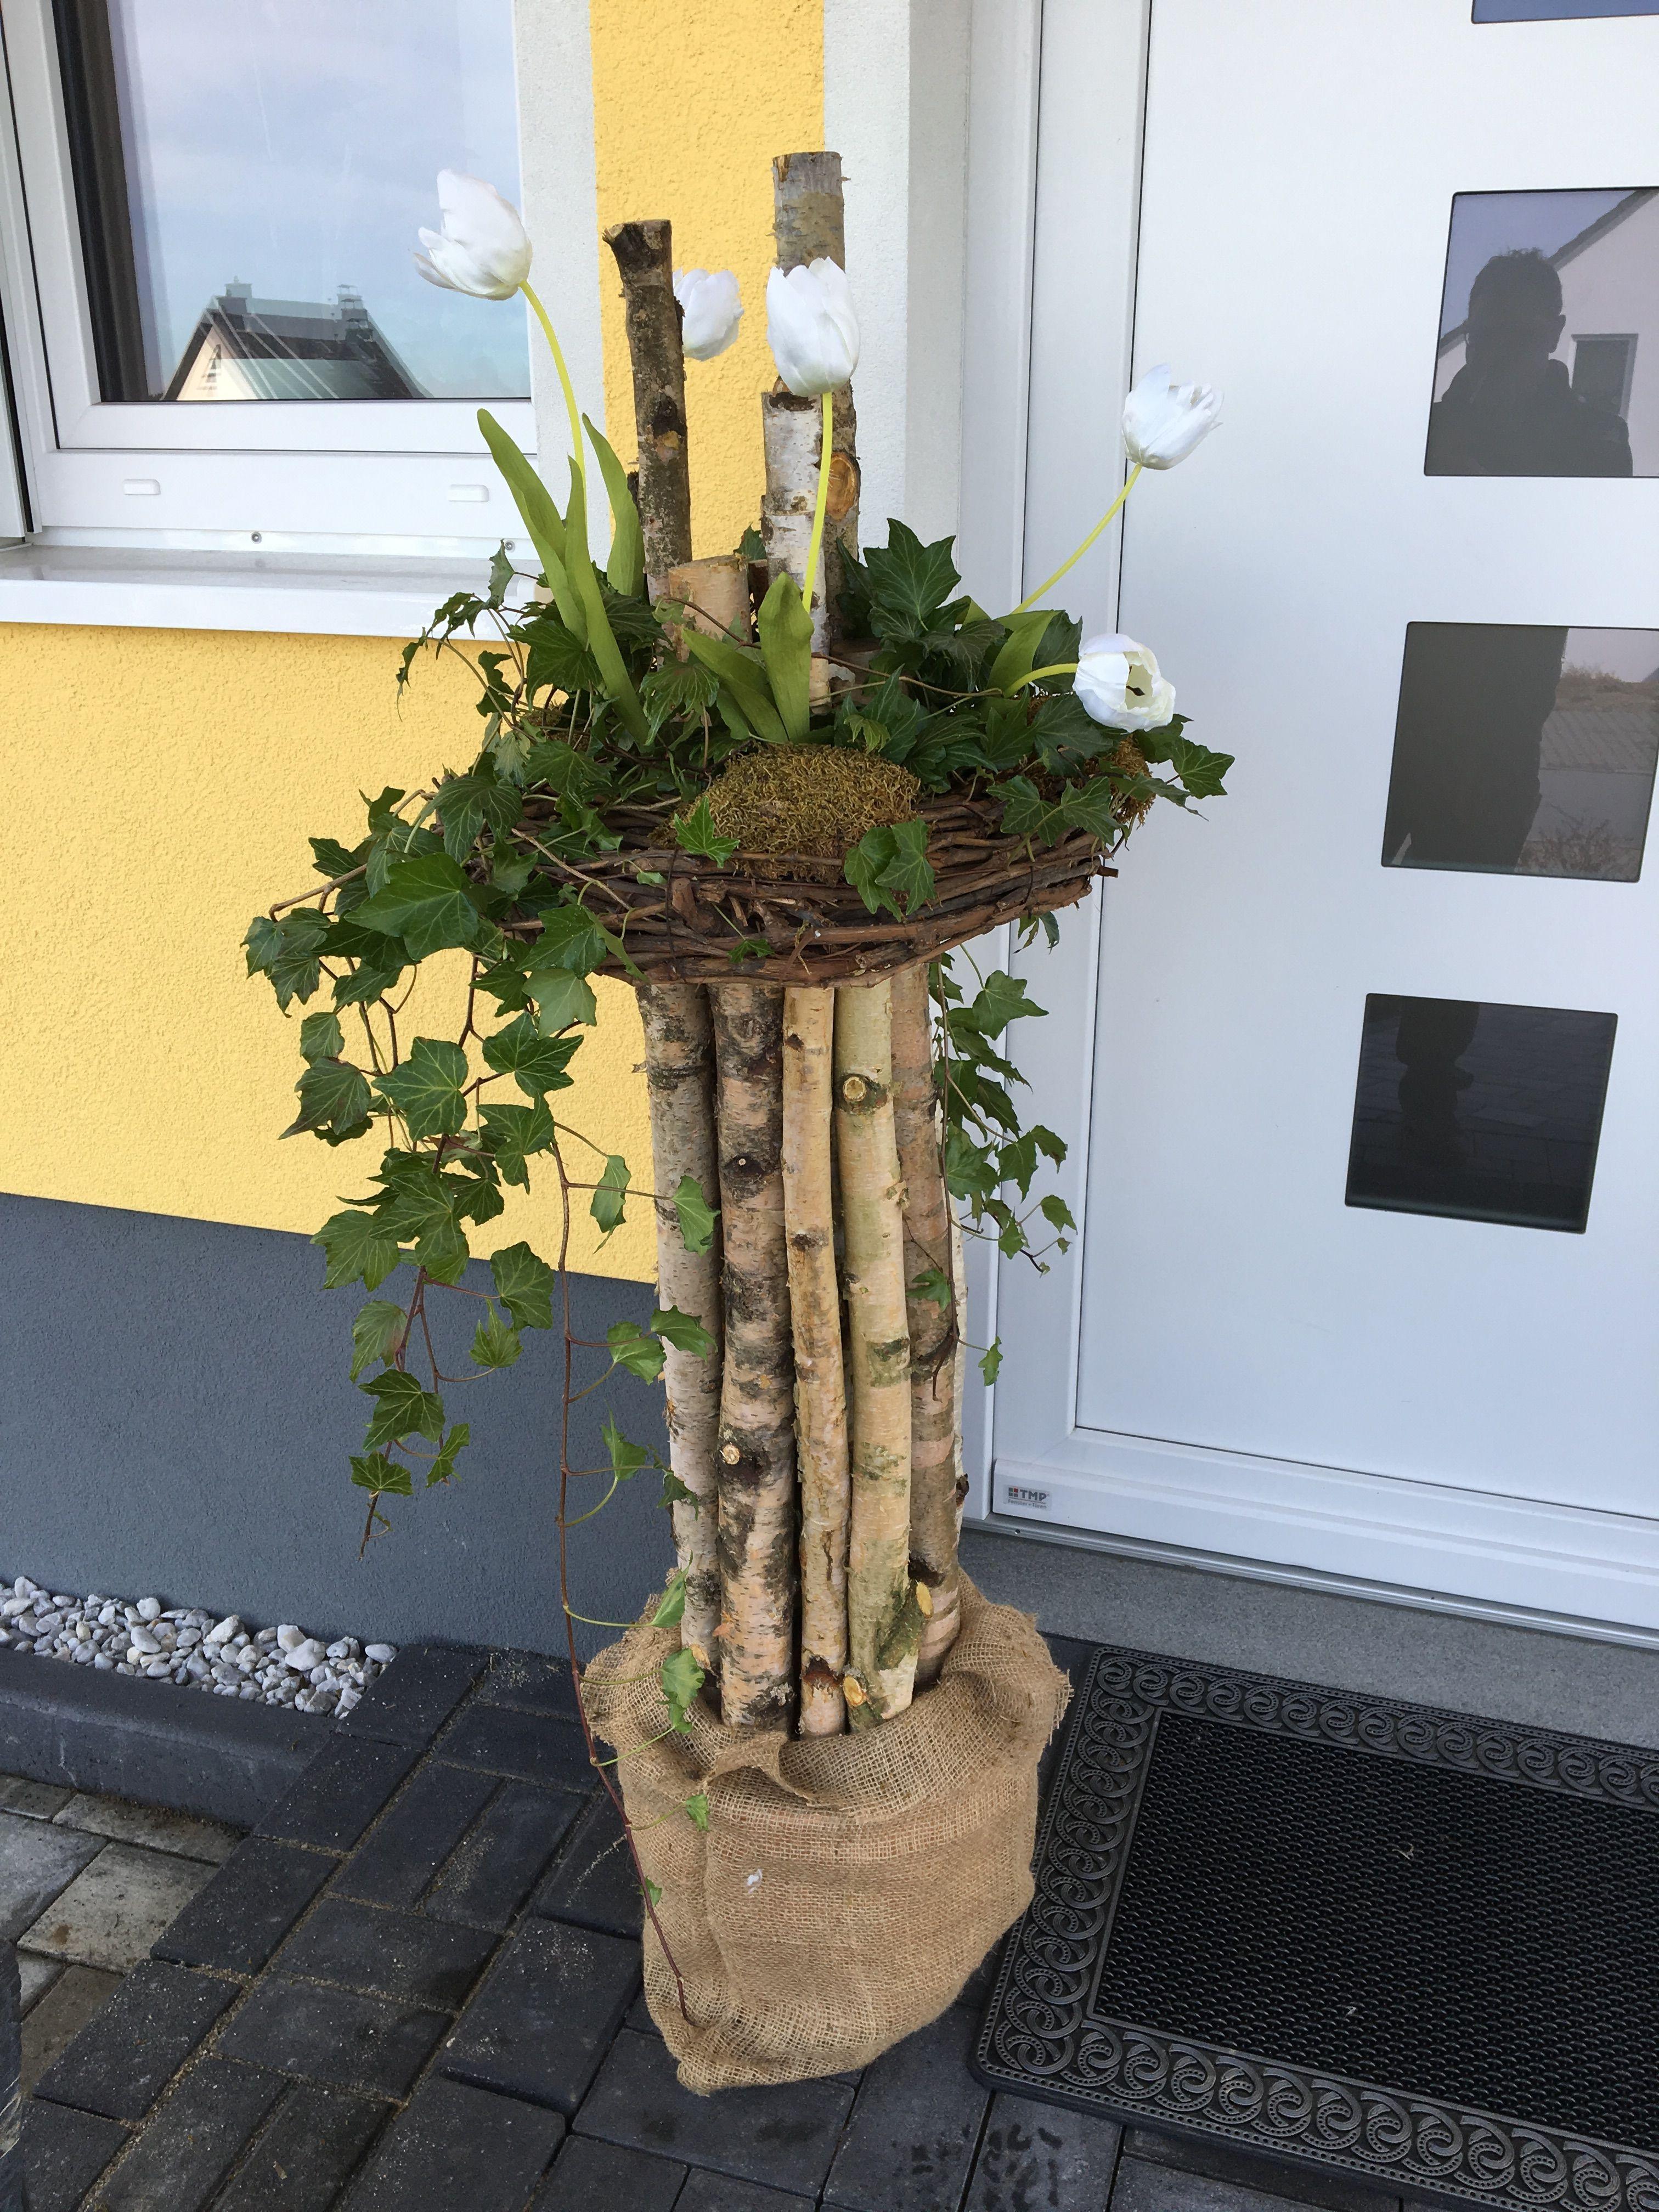 Frhlingfruhling Deko Fruhling Draussen Weihnachts Pflanzen